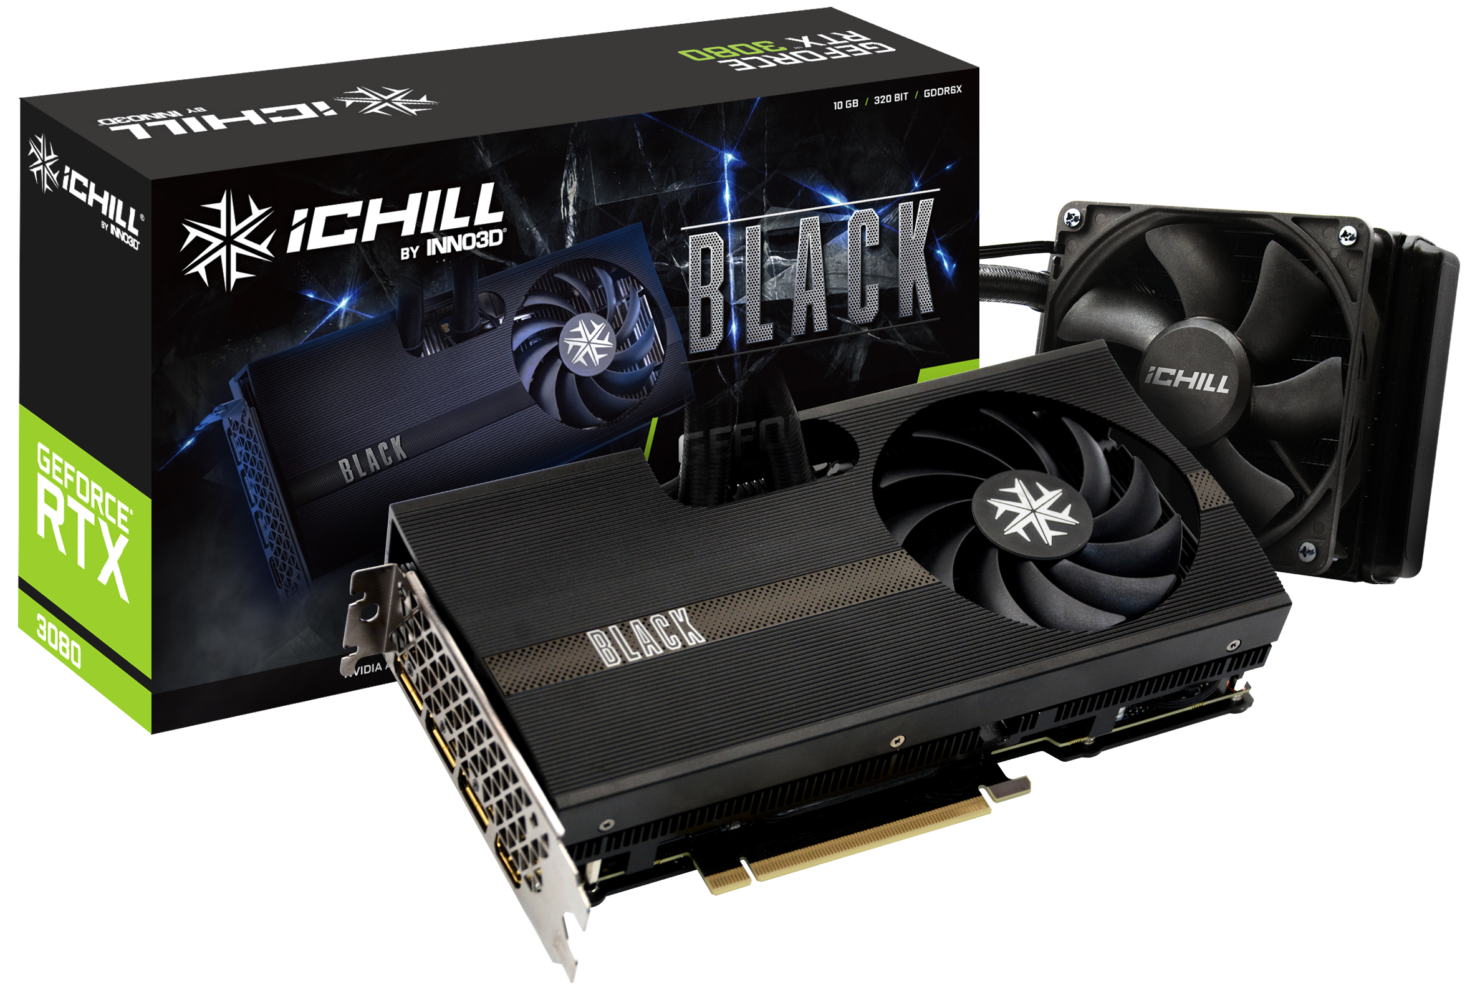 INNO3D NVIDIA GeForce RTX 3080 Ti iCHILL BLACK Graphics Card